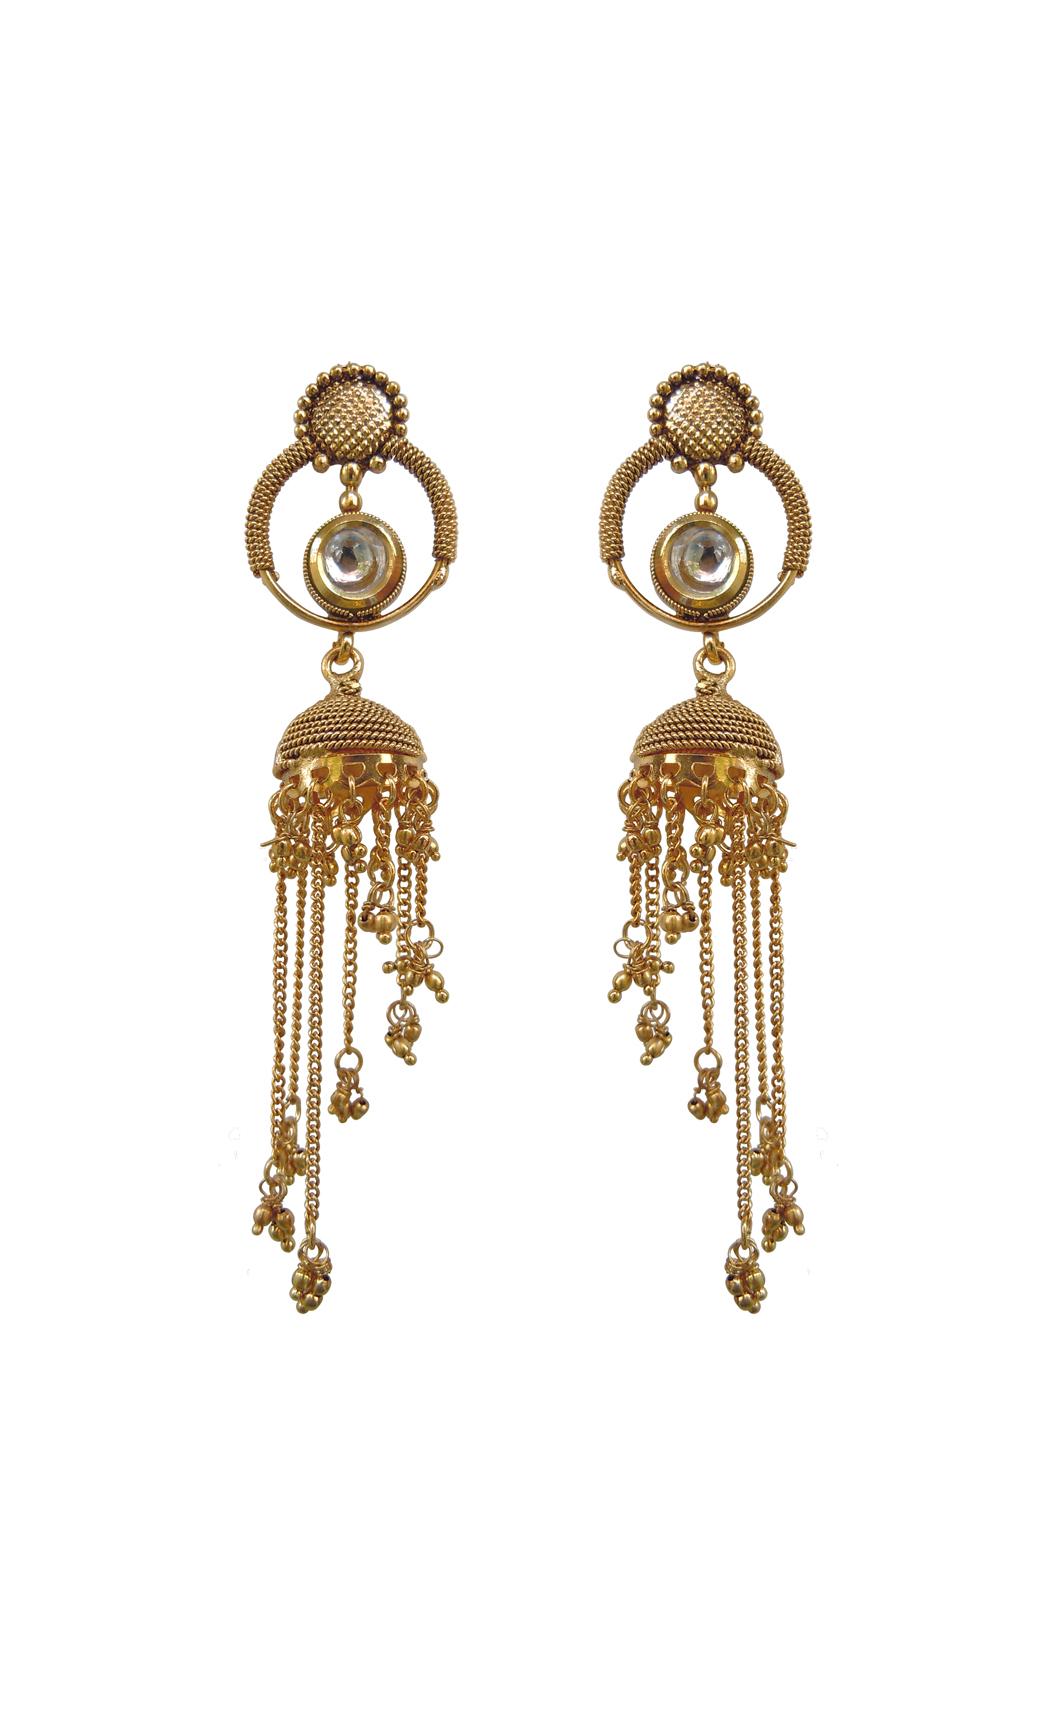 Gold Kundan Jhumkas - Shop Online